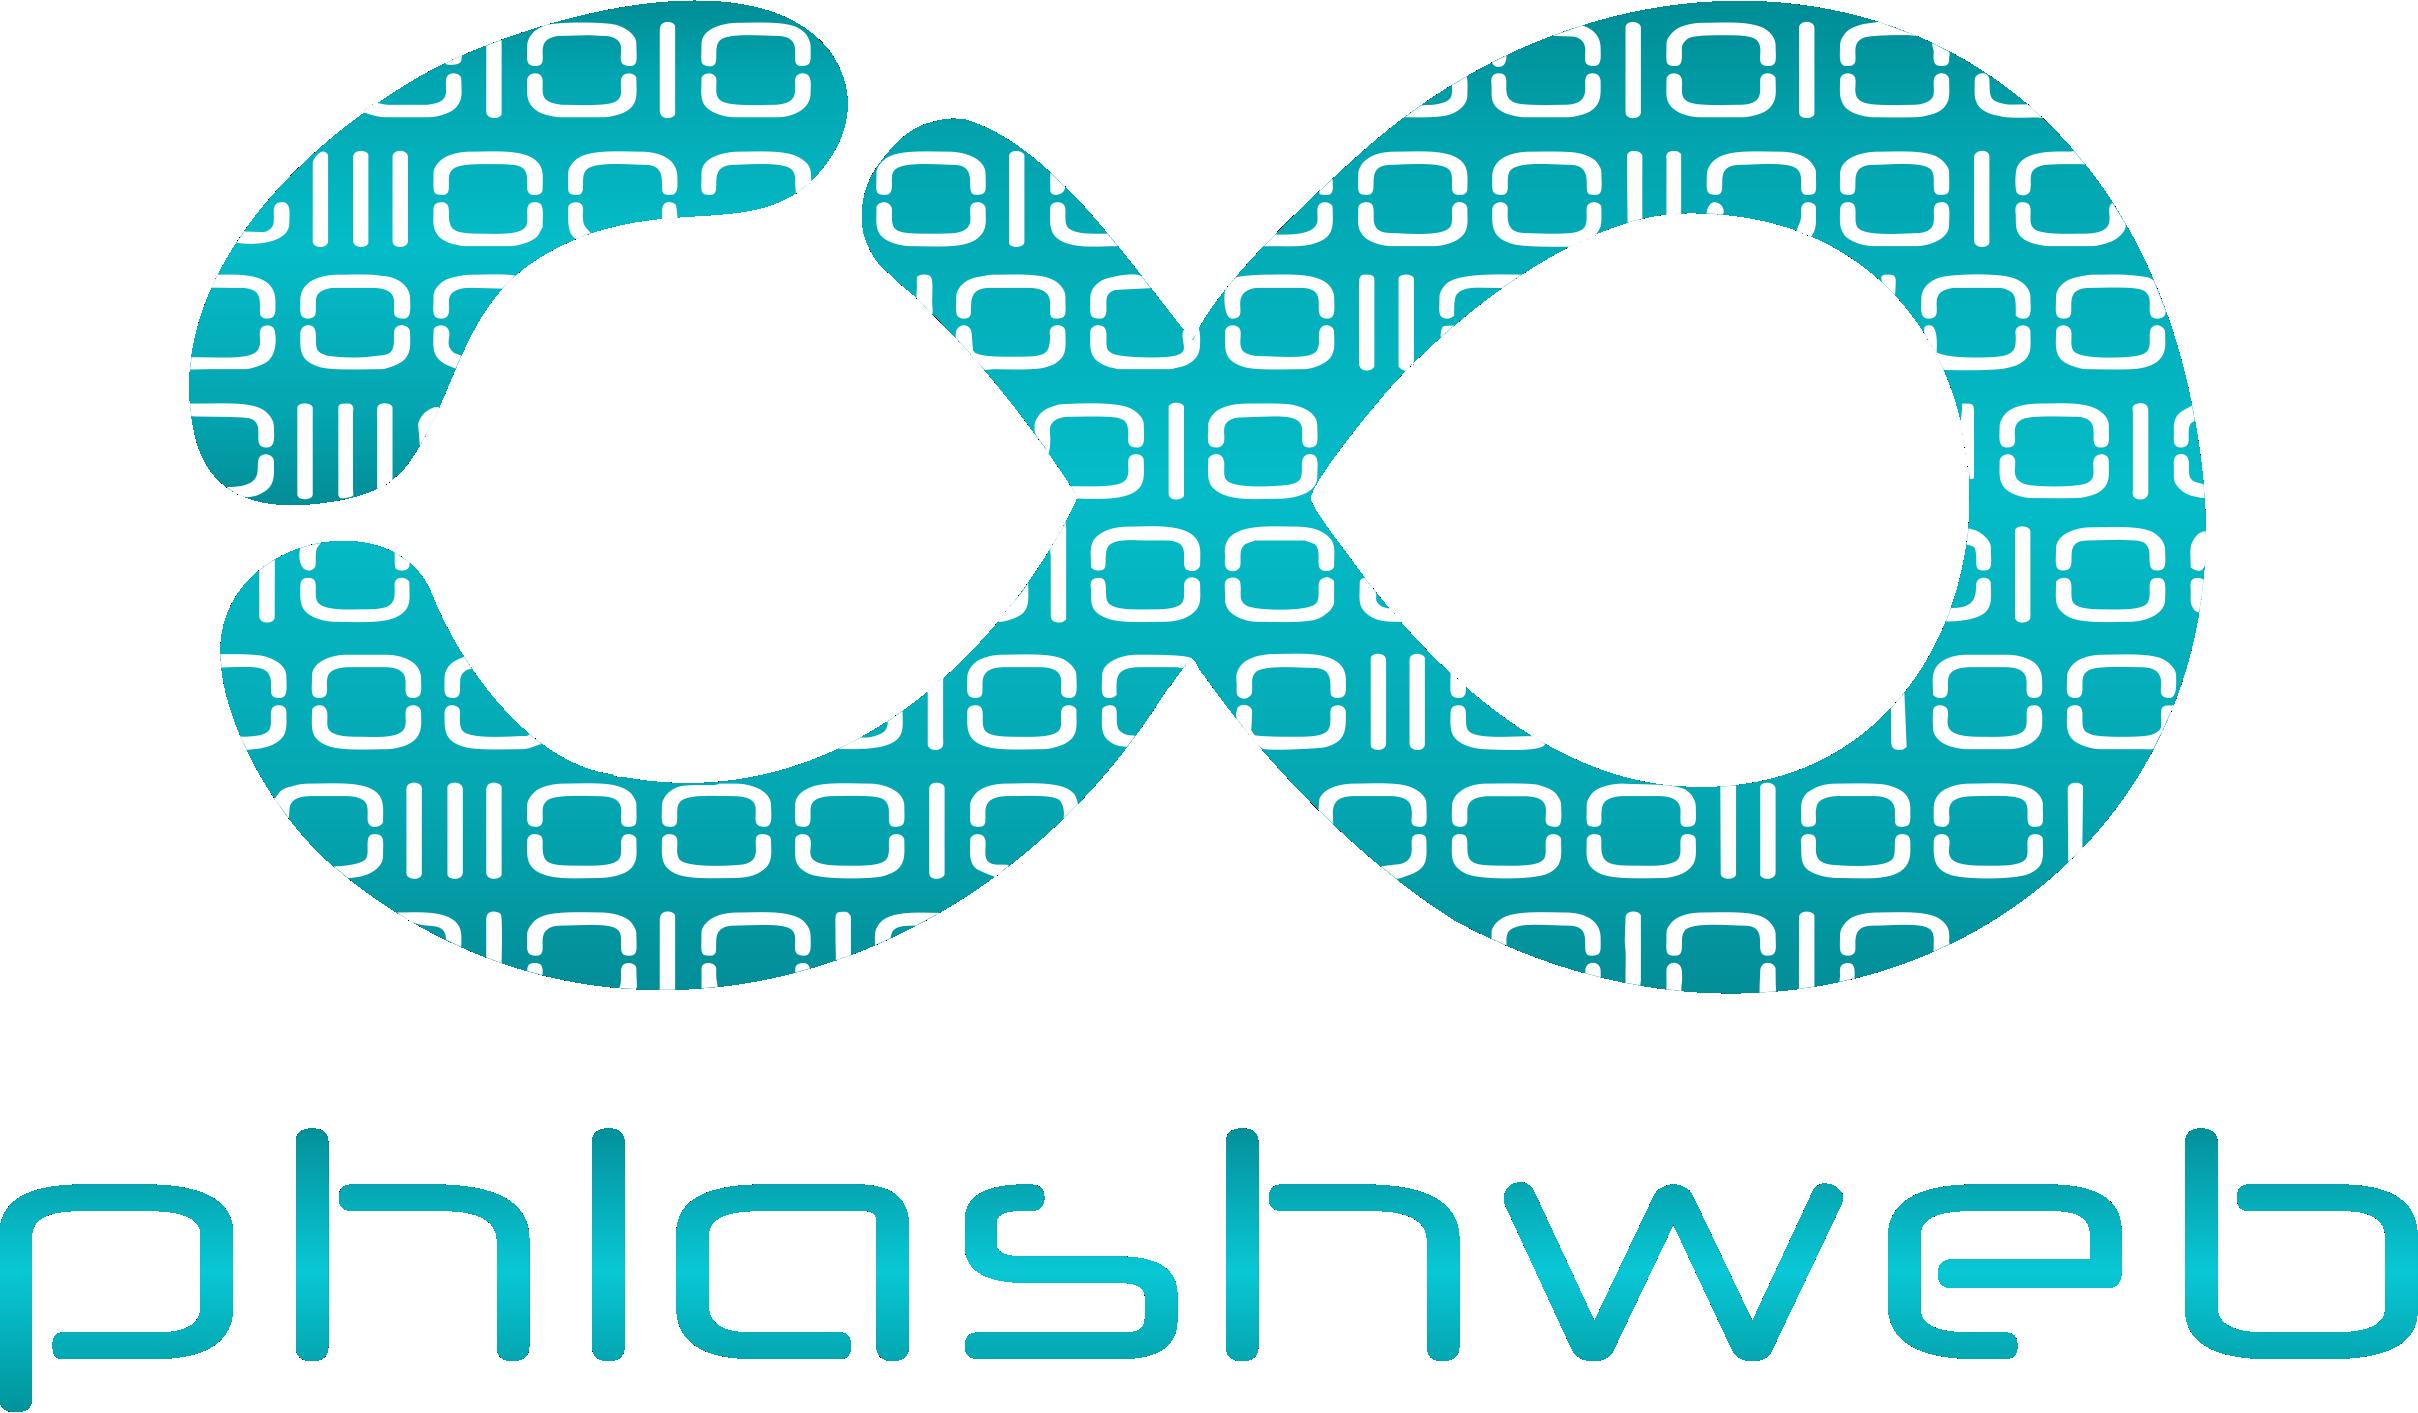 Phlashweb